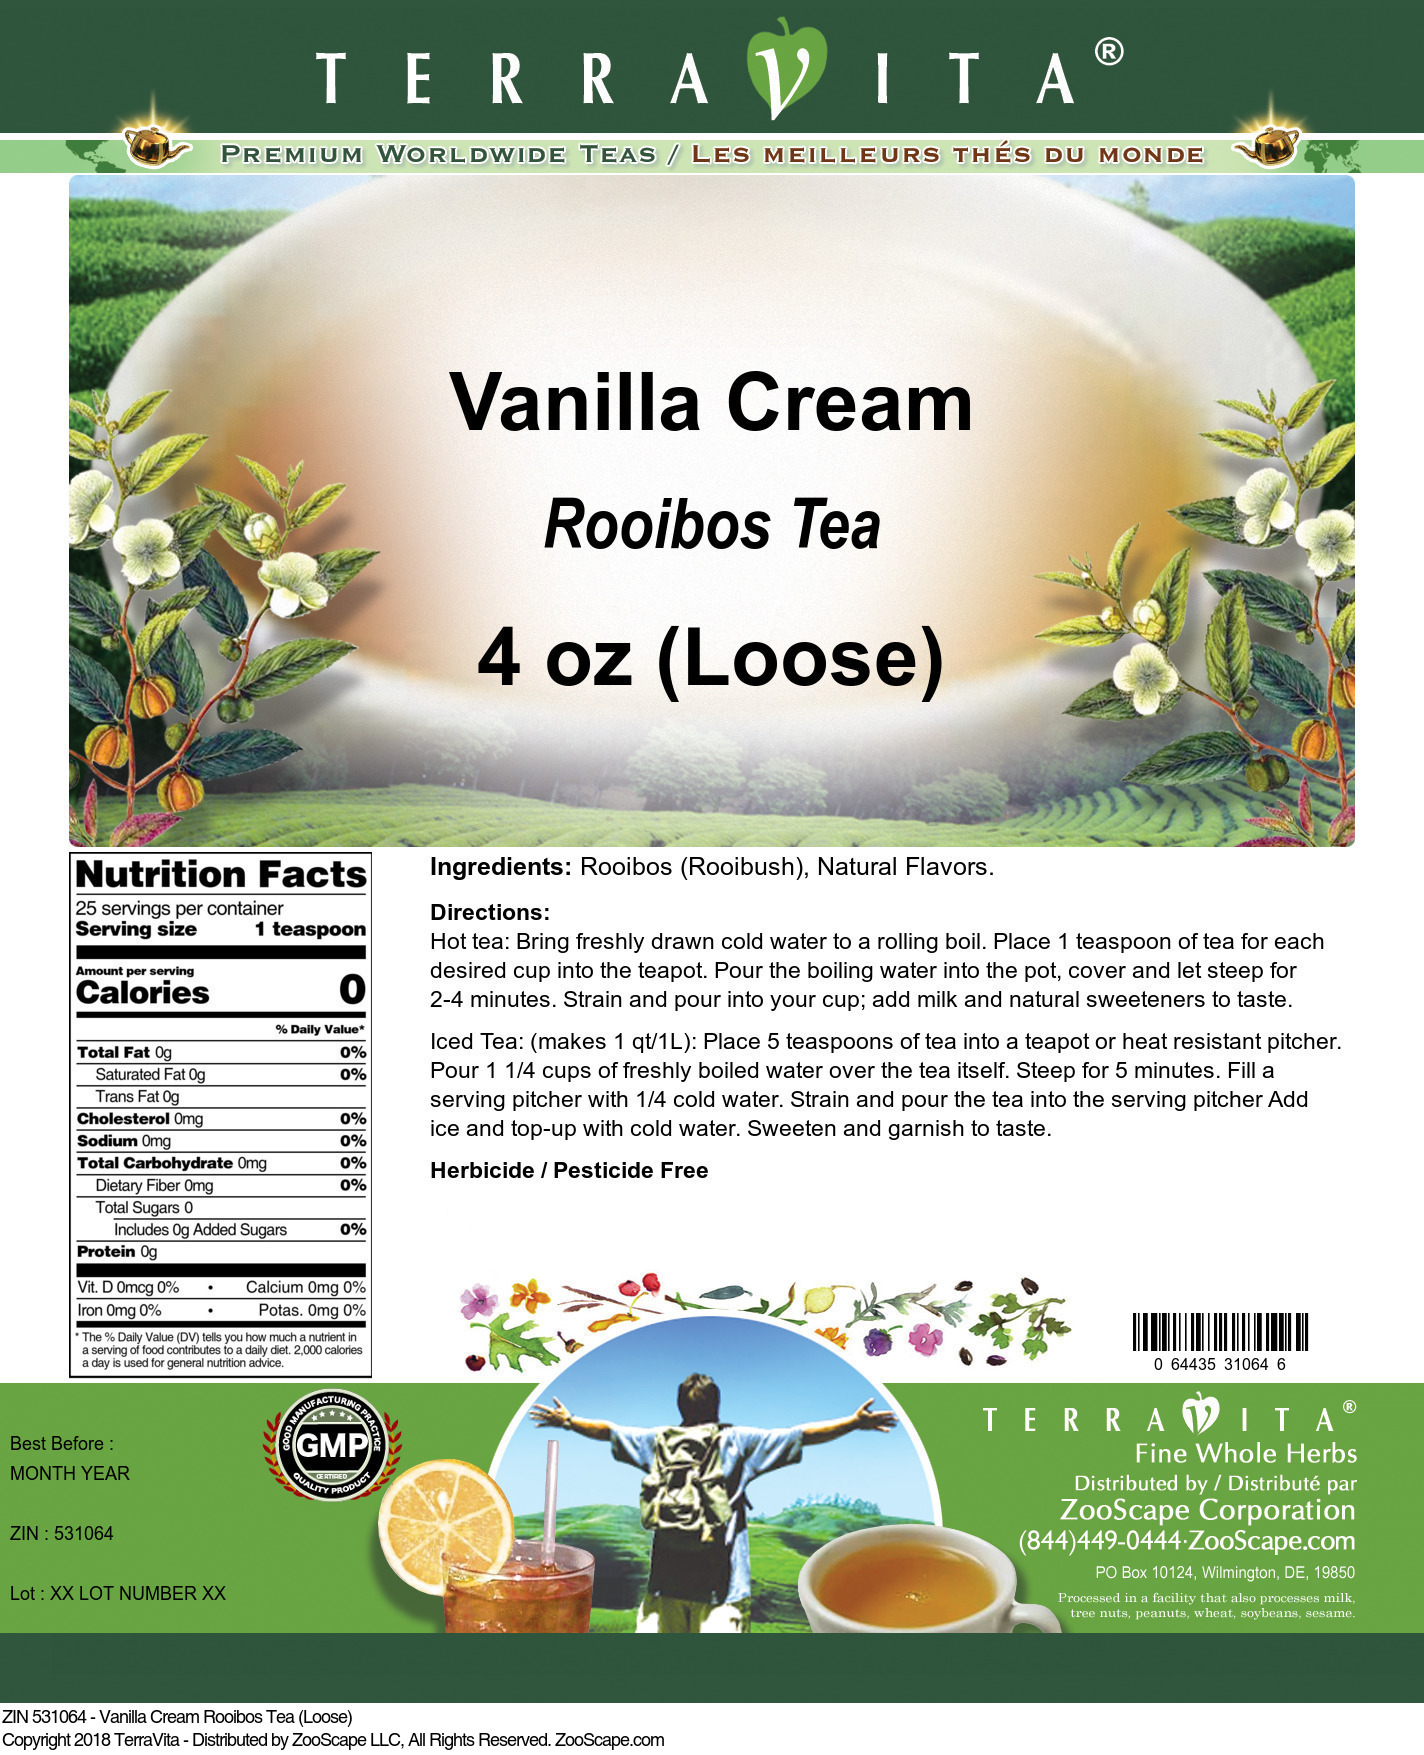 Vanilla Cream Rooibos Tea (Loose)